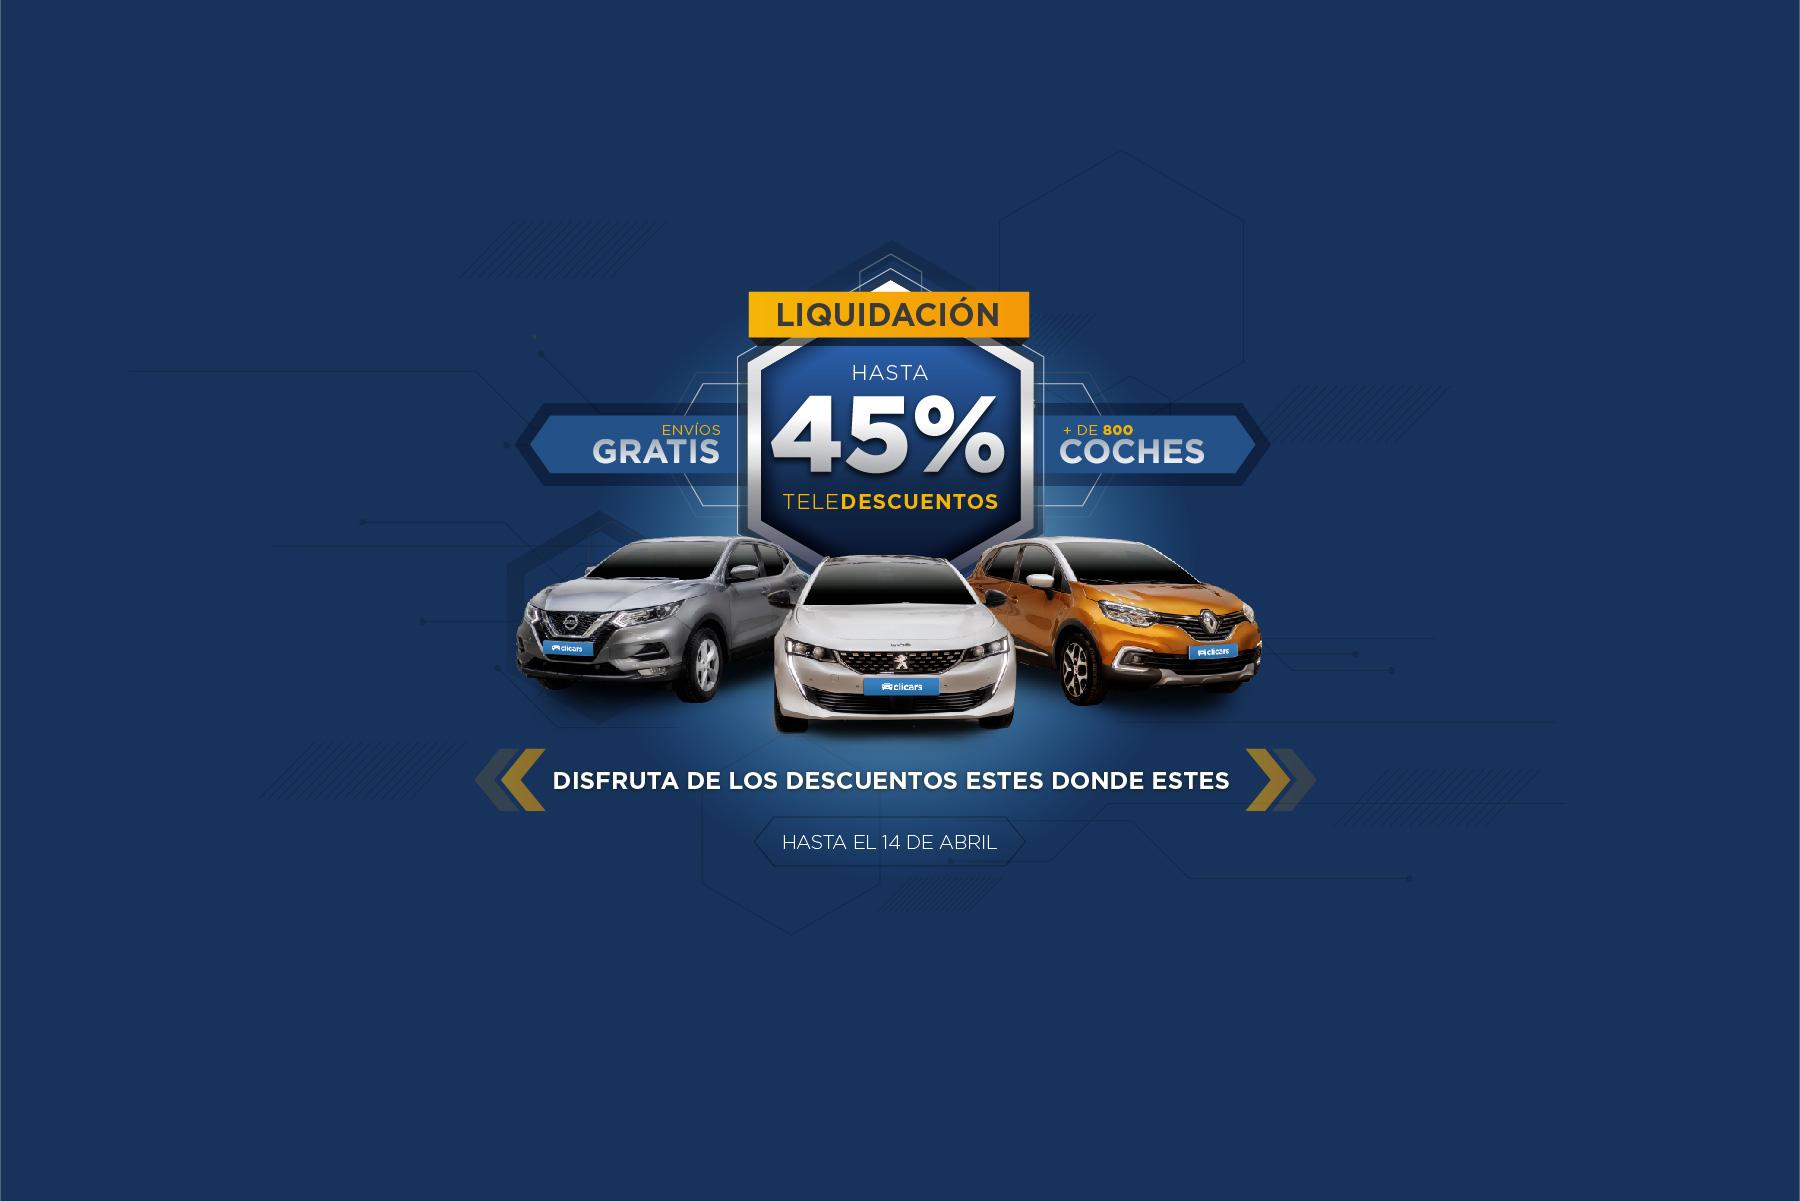 Peugeot 208 Gasolina 5P Signature 1.2L PureTech 60KW (82CV) 2